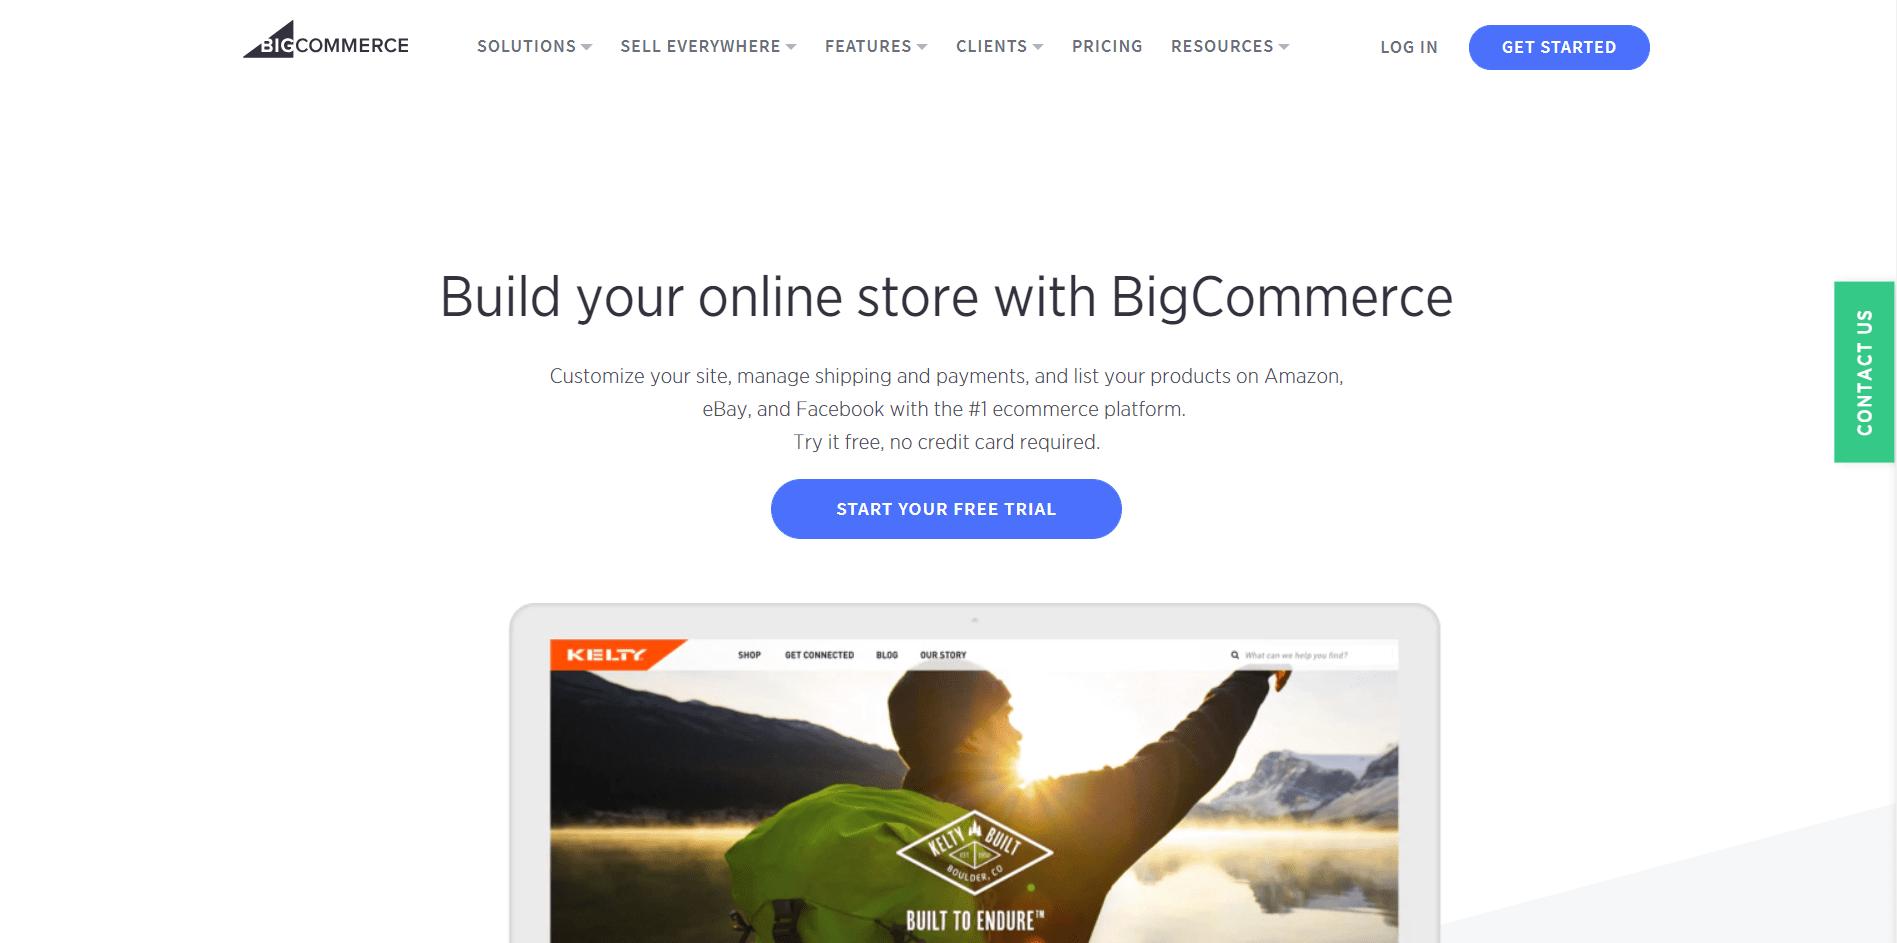 bigcommerce-homepage